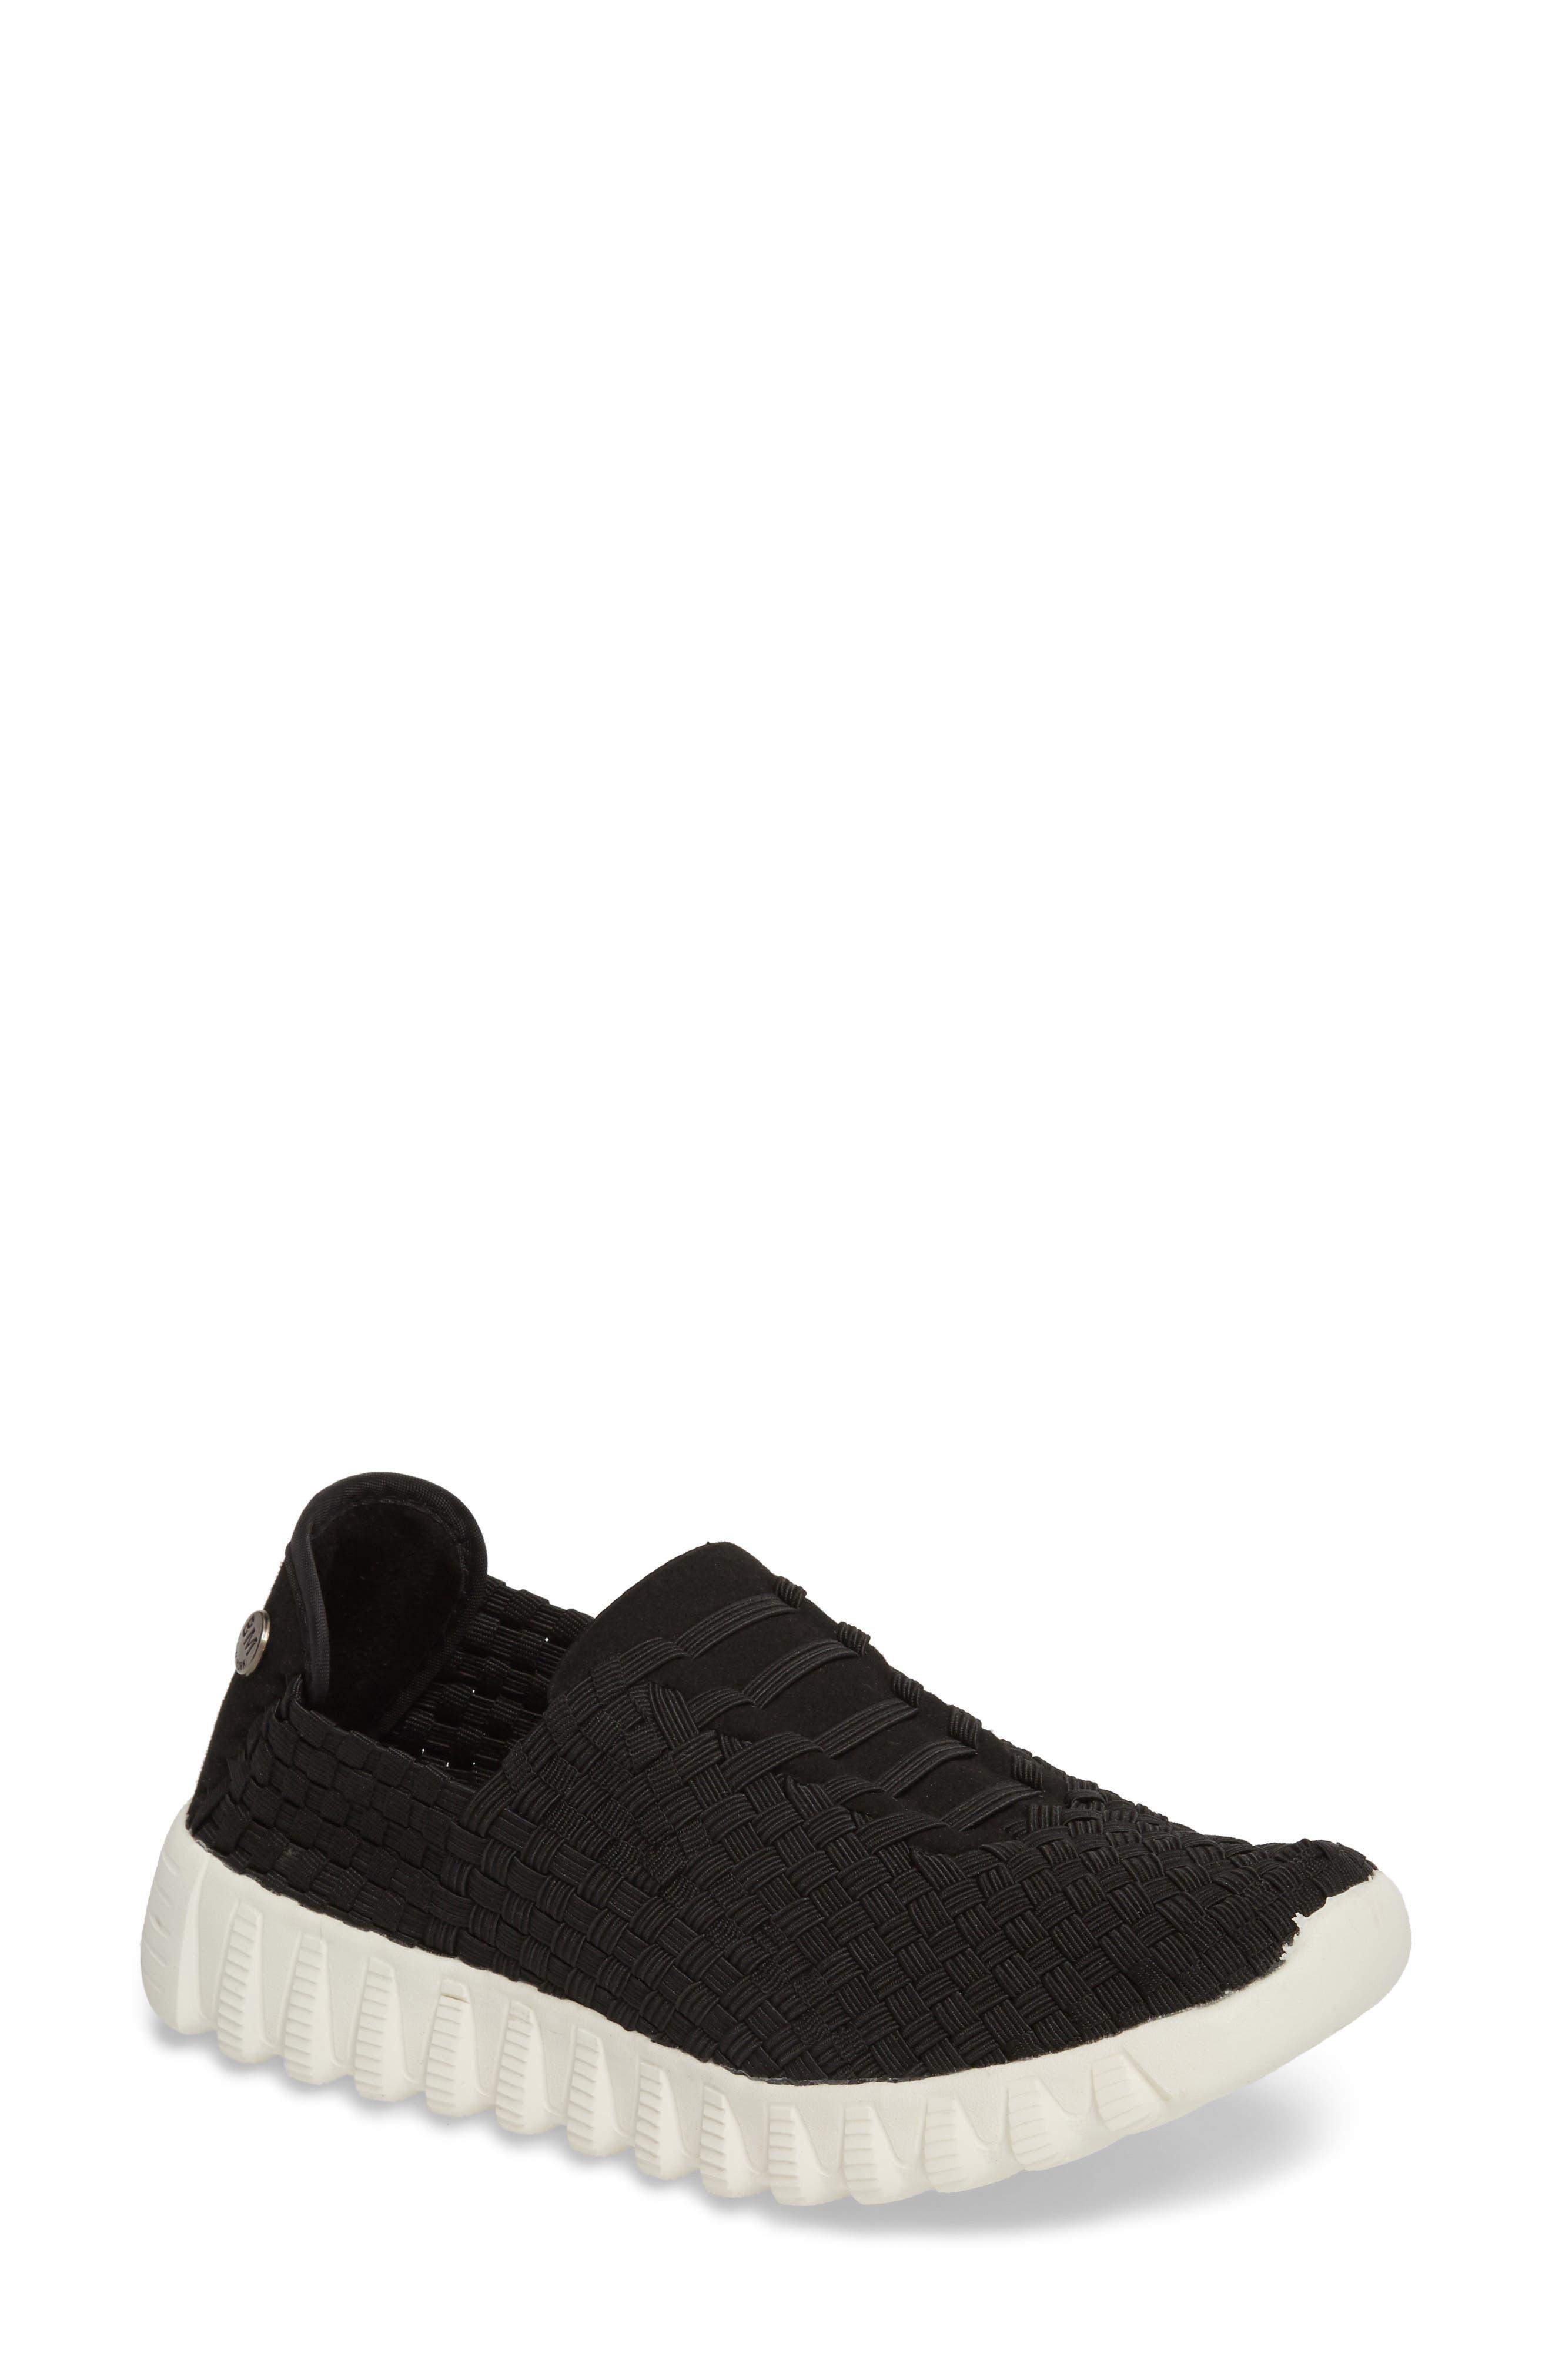 Vivaldi Slip-On Sneaker,                             Main thumbnail 1, color,                             Black